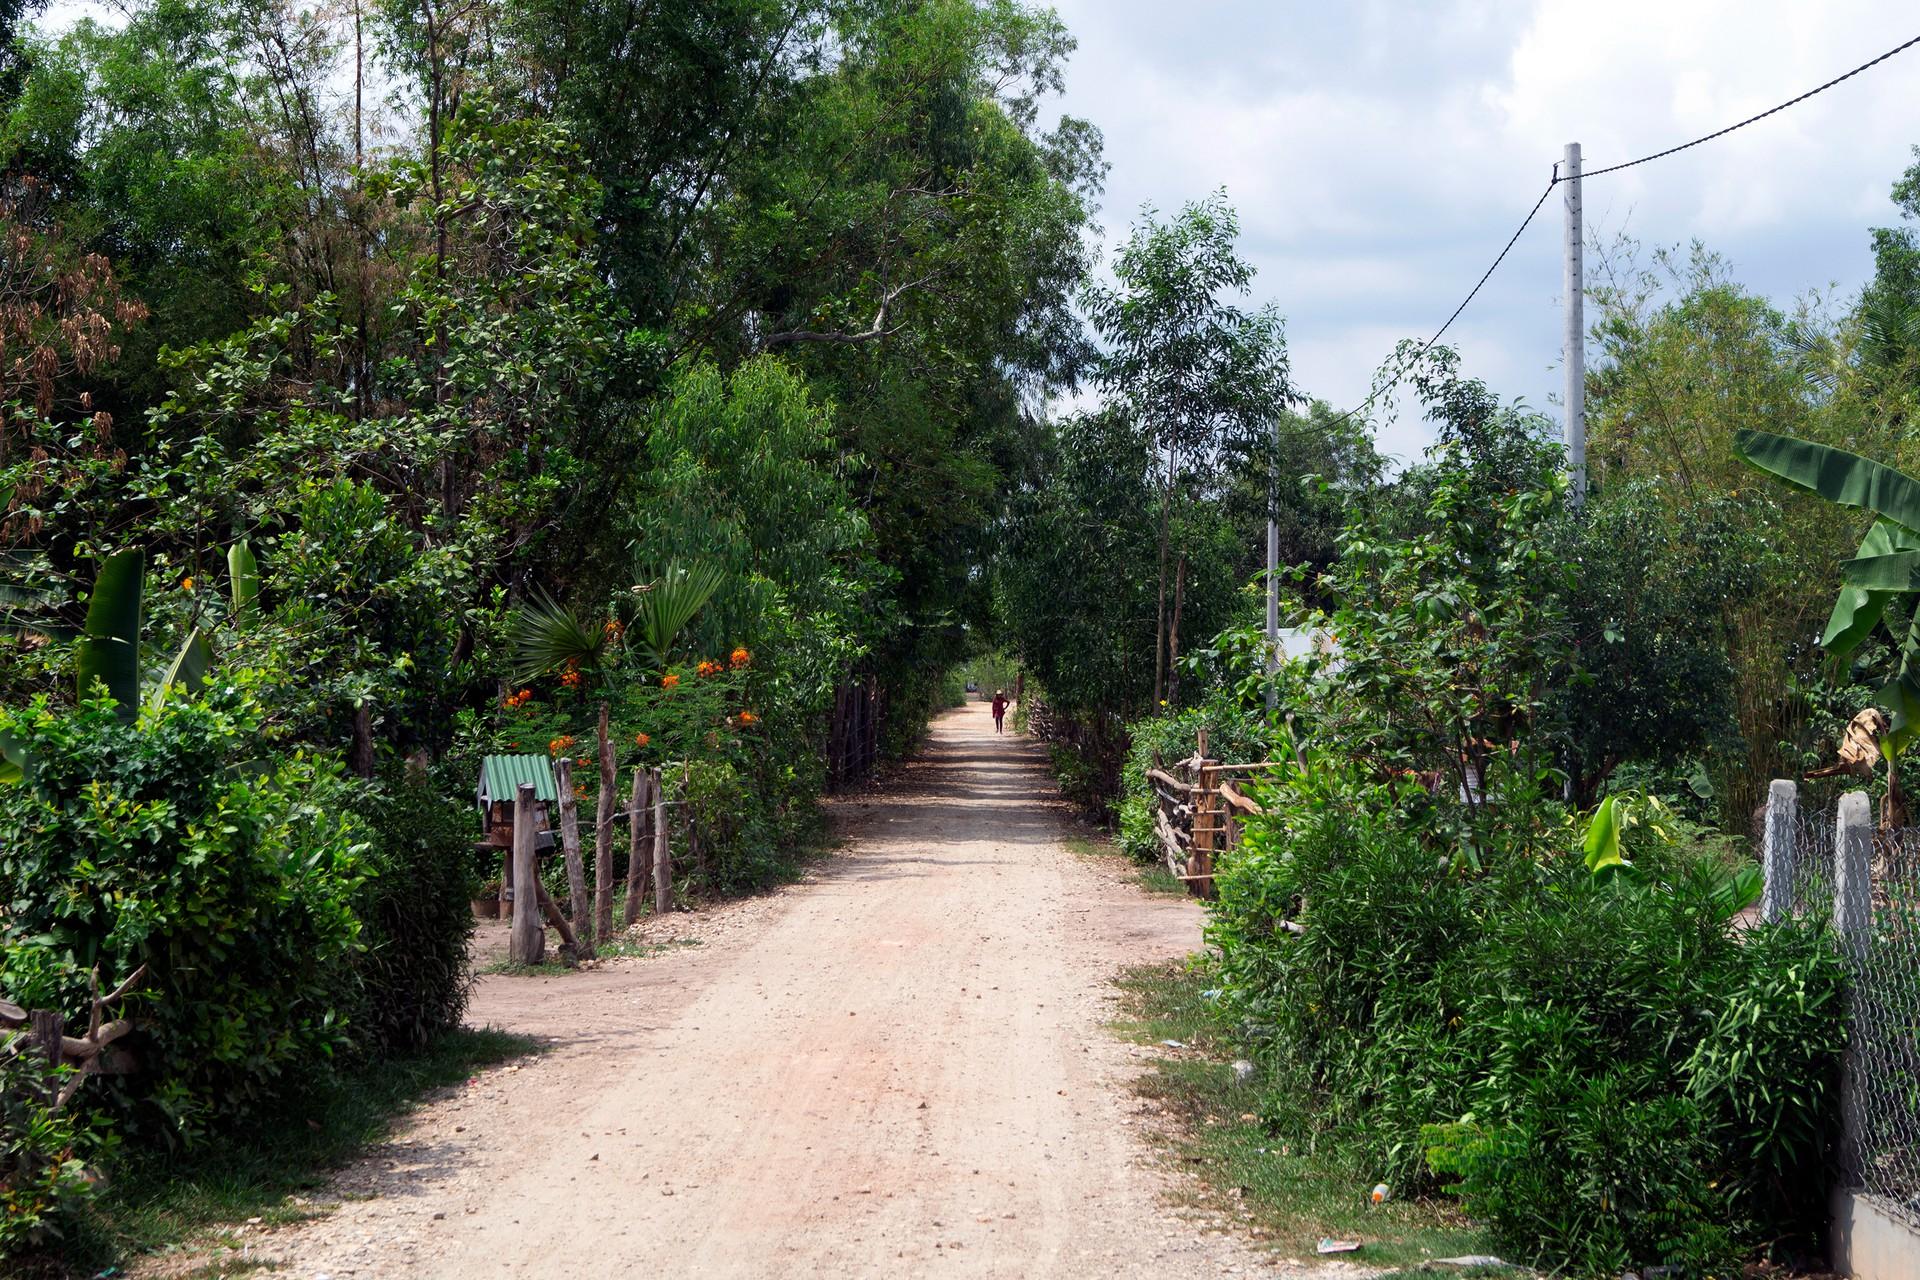 The village of Kampout Tuk, Cambodia.